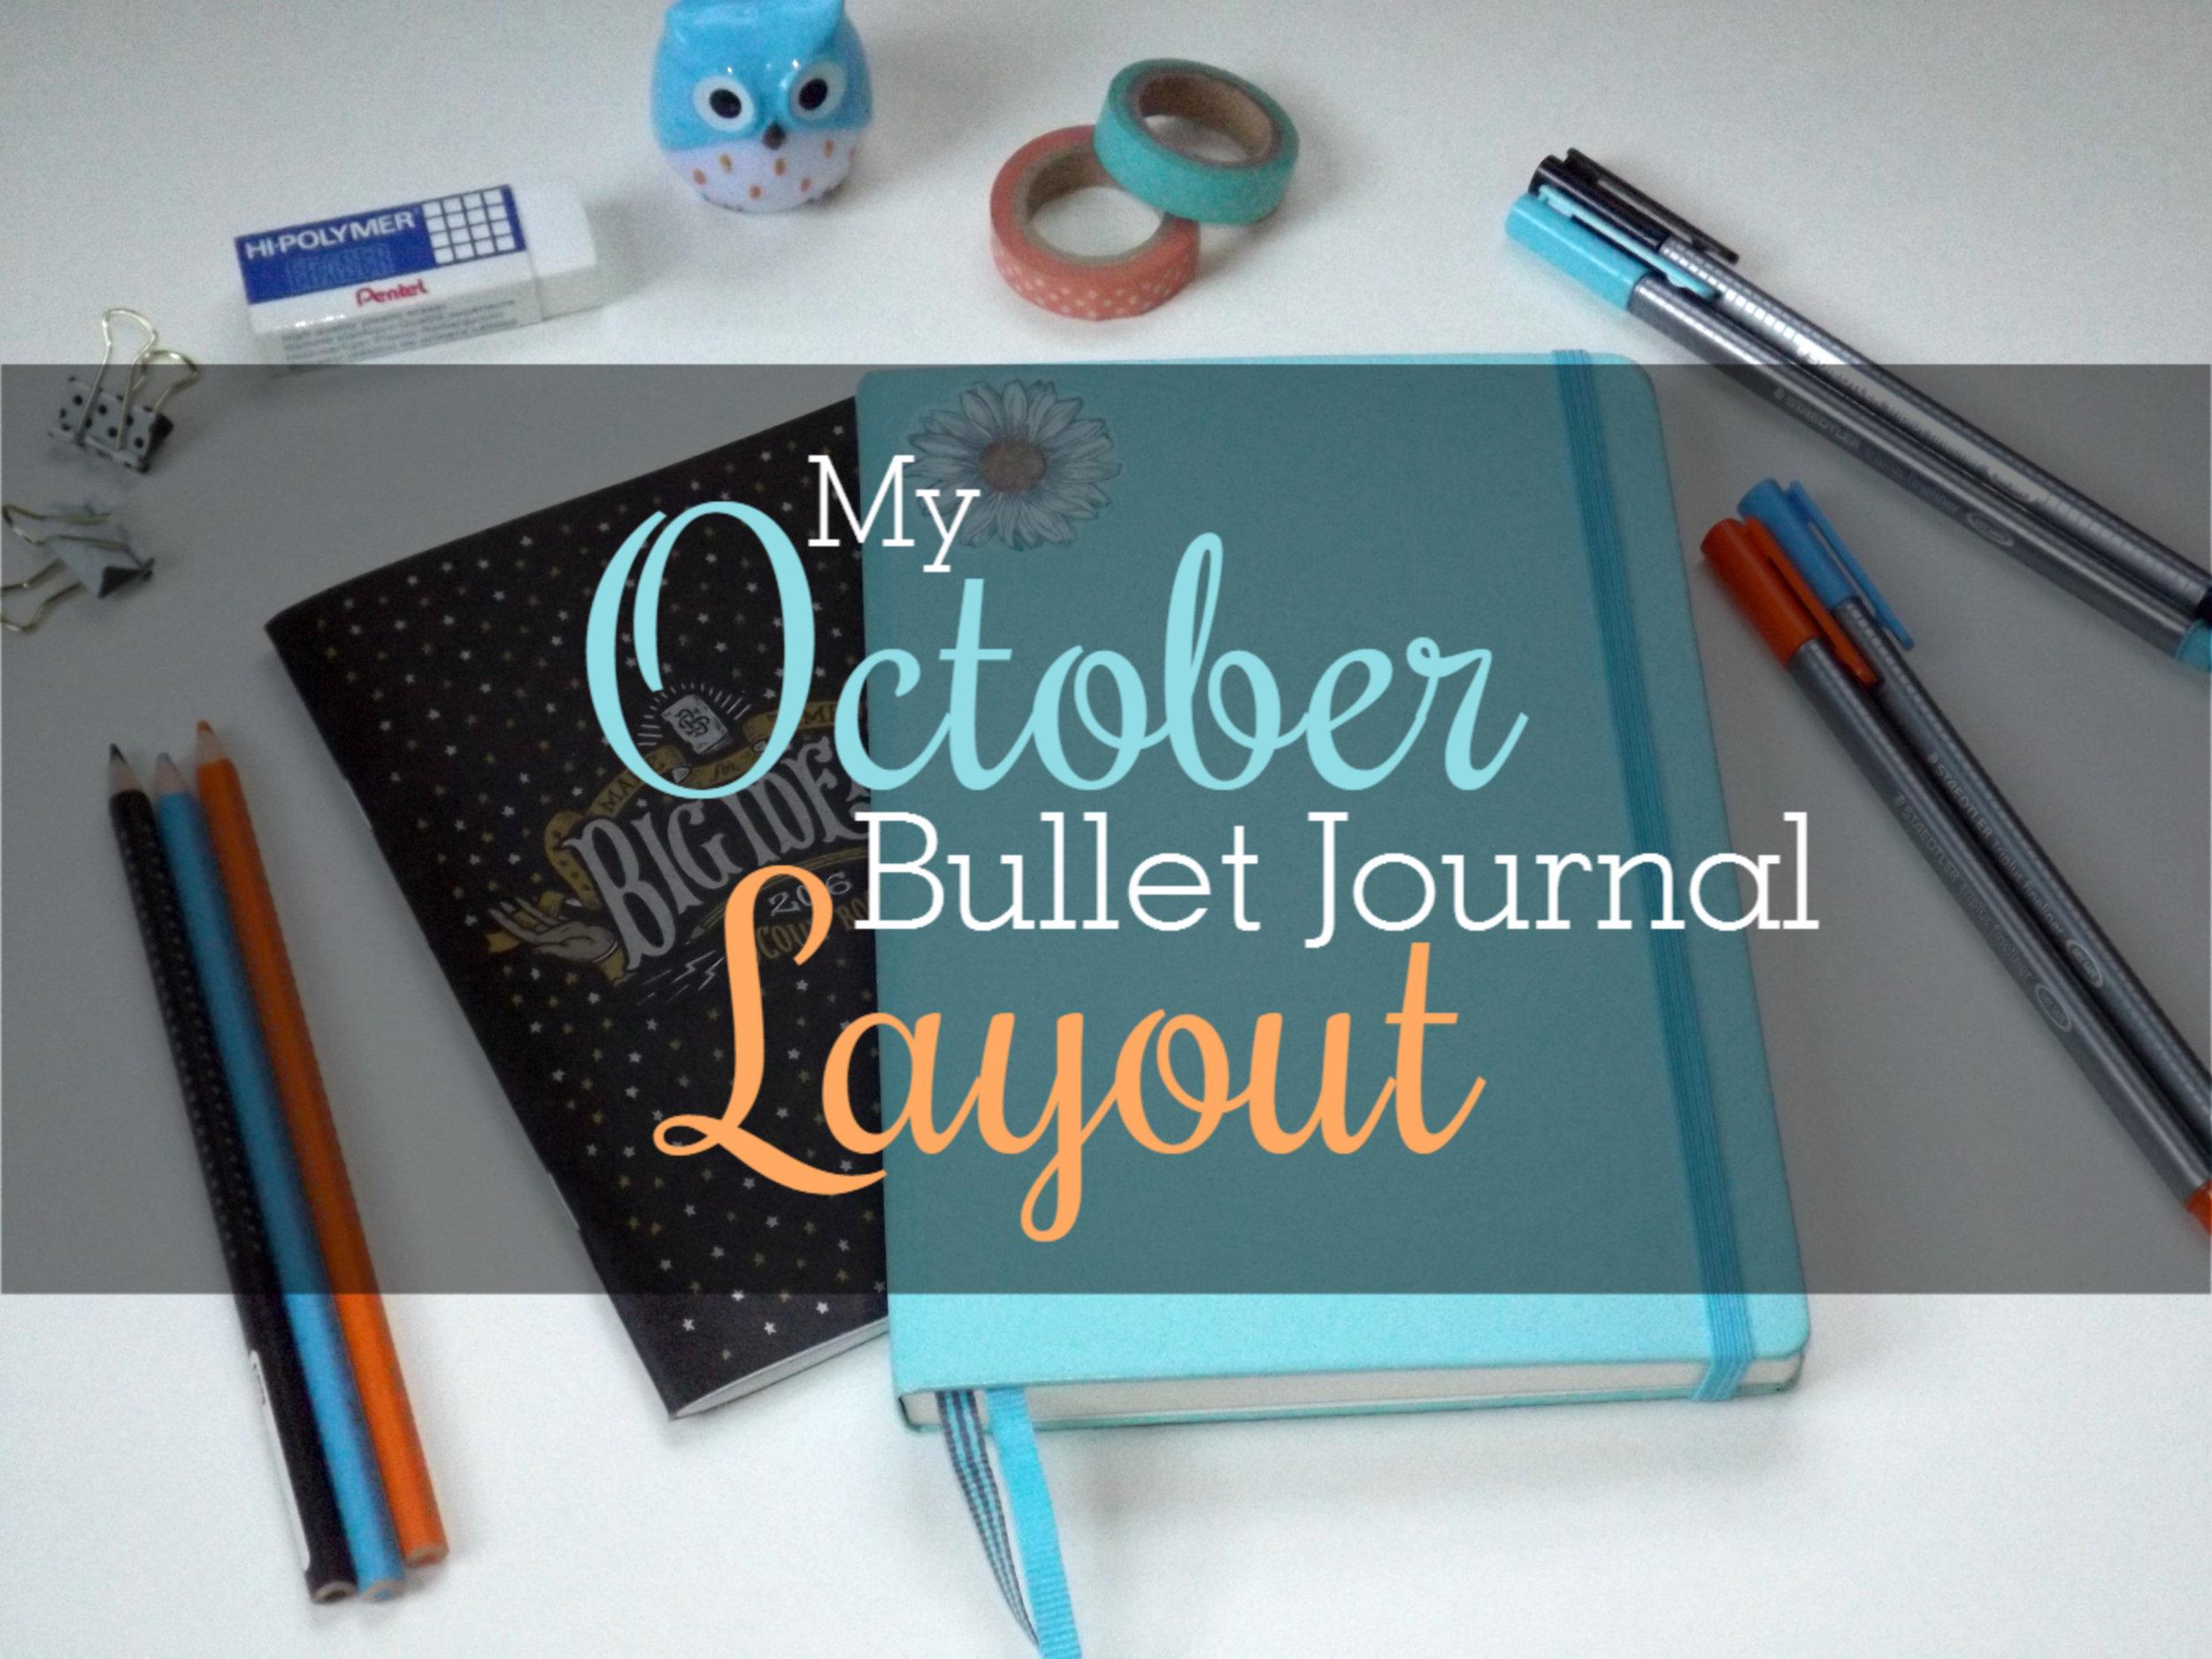 #TBT - October 2016 Bullet Journal Layout